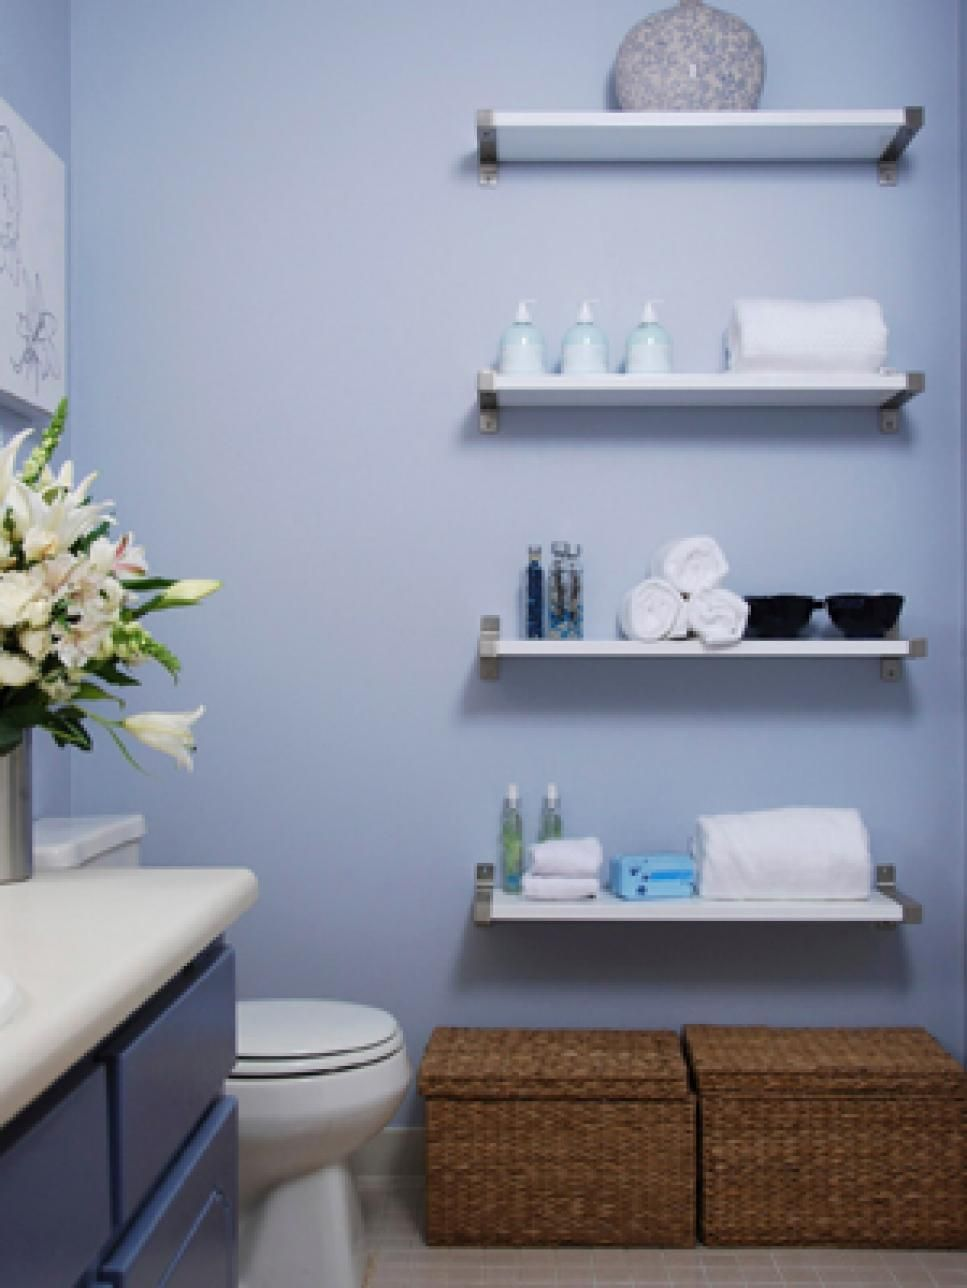 Diy bathroom wall decor ideas top diy bathroom ideas  top diy bathroom ideas  pinterest